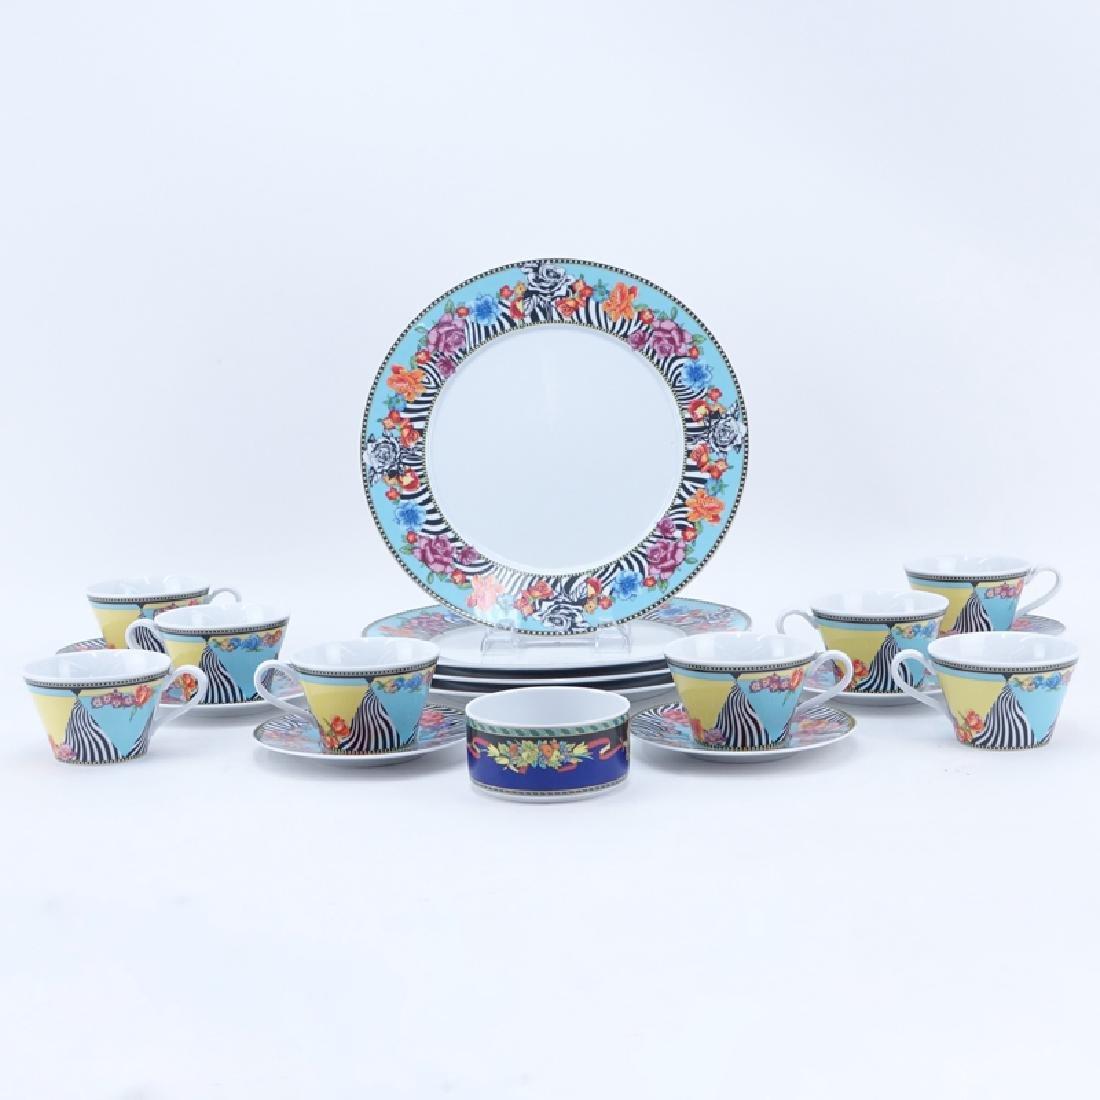 Nineteen (19) Pc Rosenthal Versace Porcelain